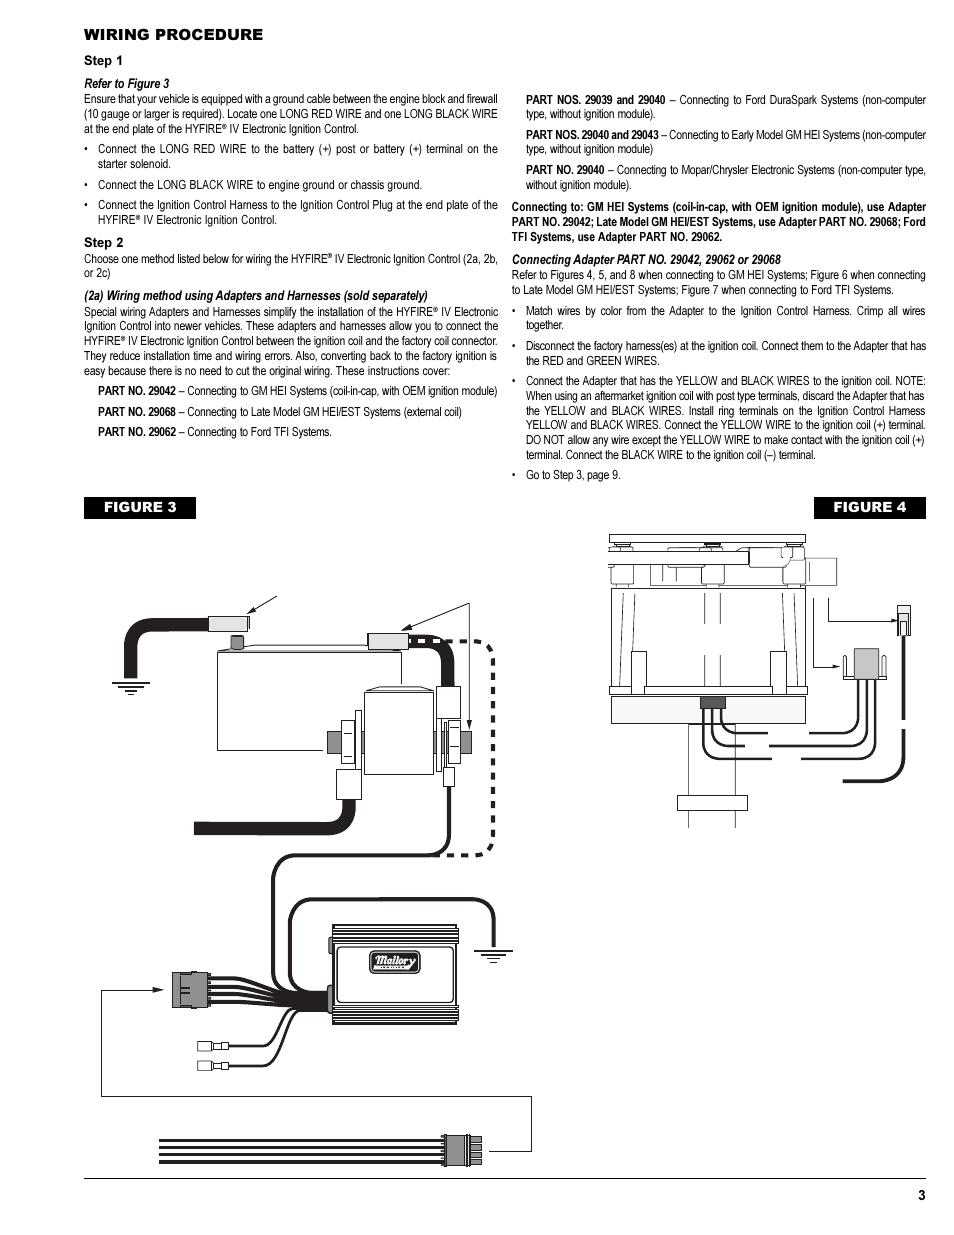 Peugeot 206 alternator wiring diagram on peugeot download wirning on peugeot 206 ignition wiring diagram Chevy Ignition Wiring Diagram Audi A4 Diagram